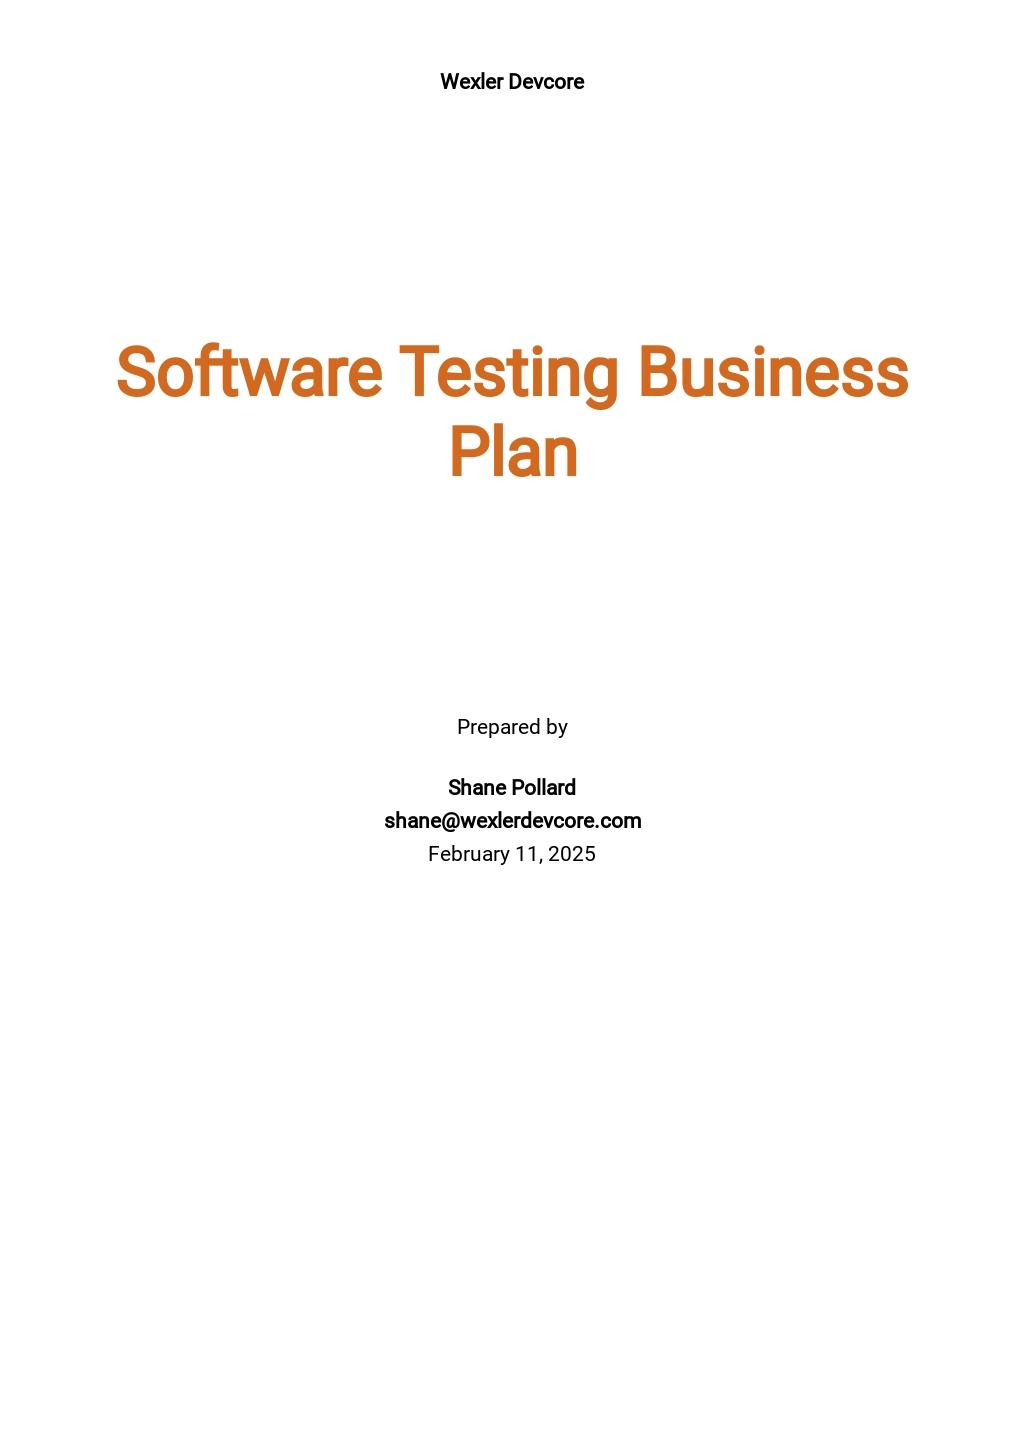 Software Testing Business Plan Template.jpe